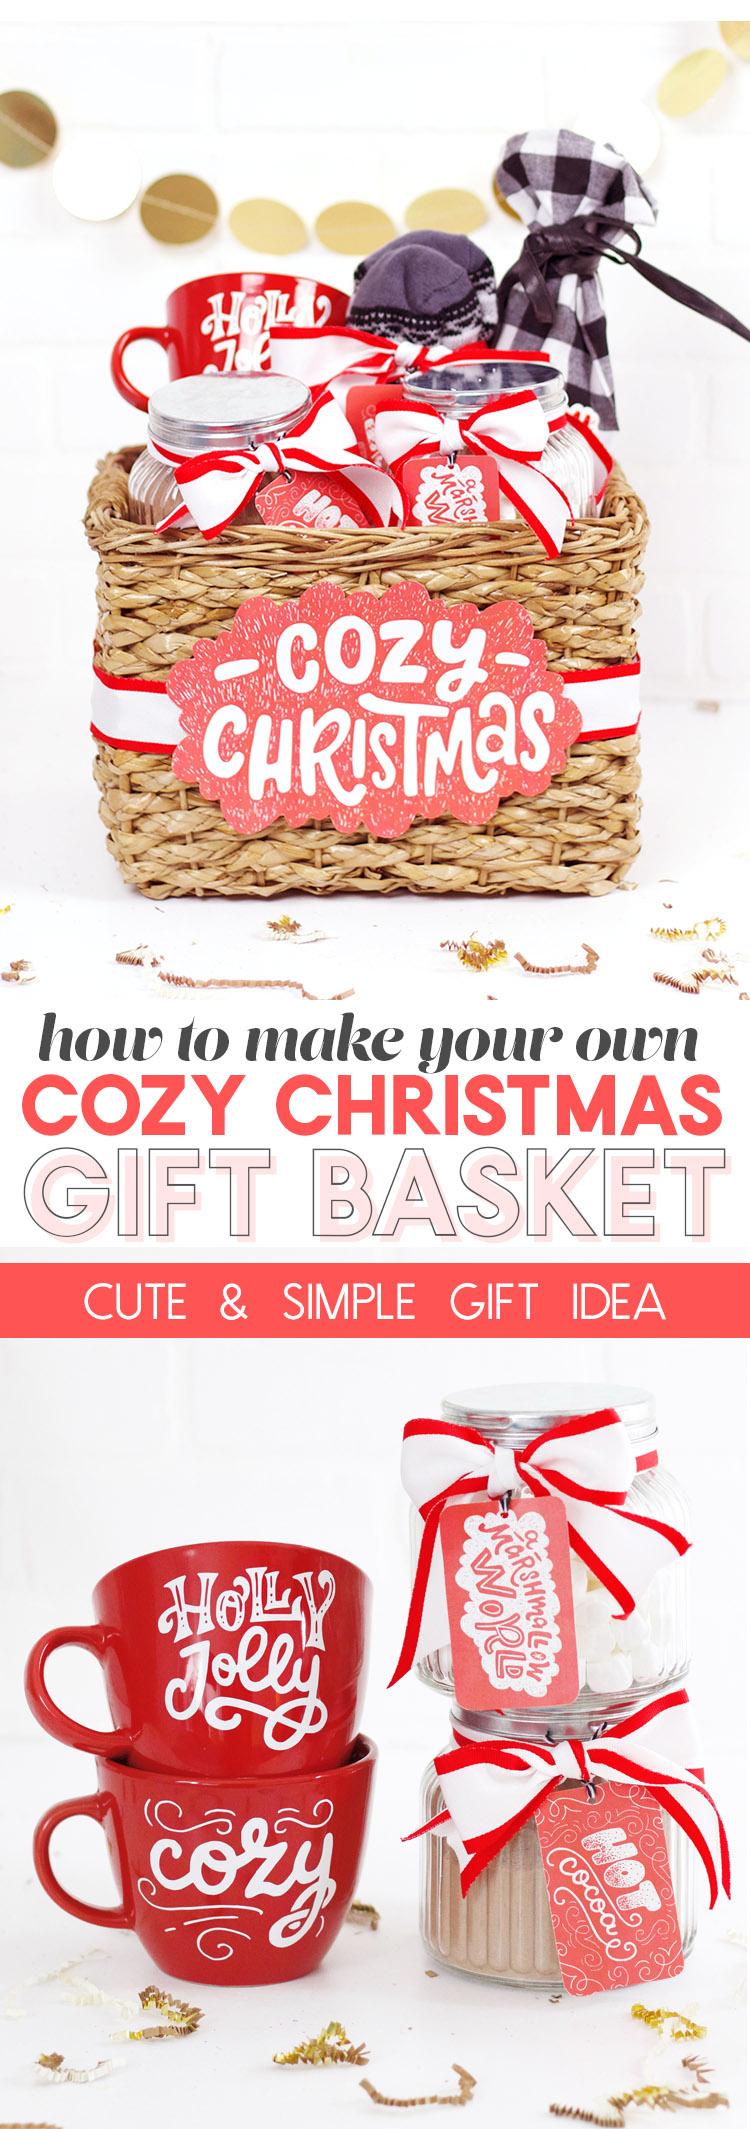 cozy christmas gift basket idea